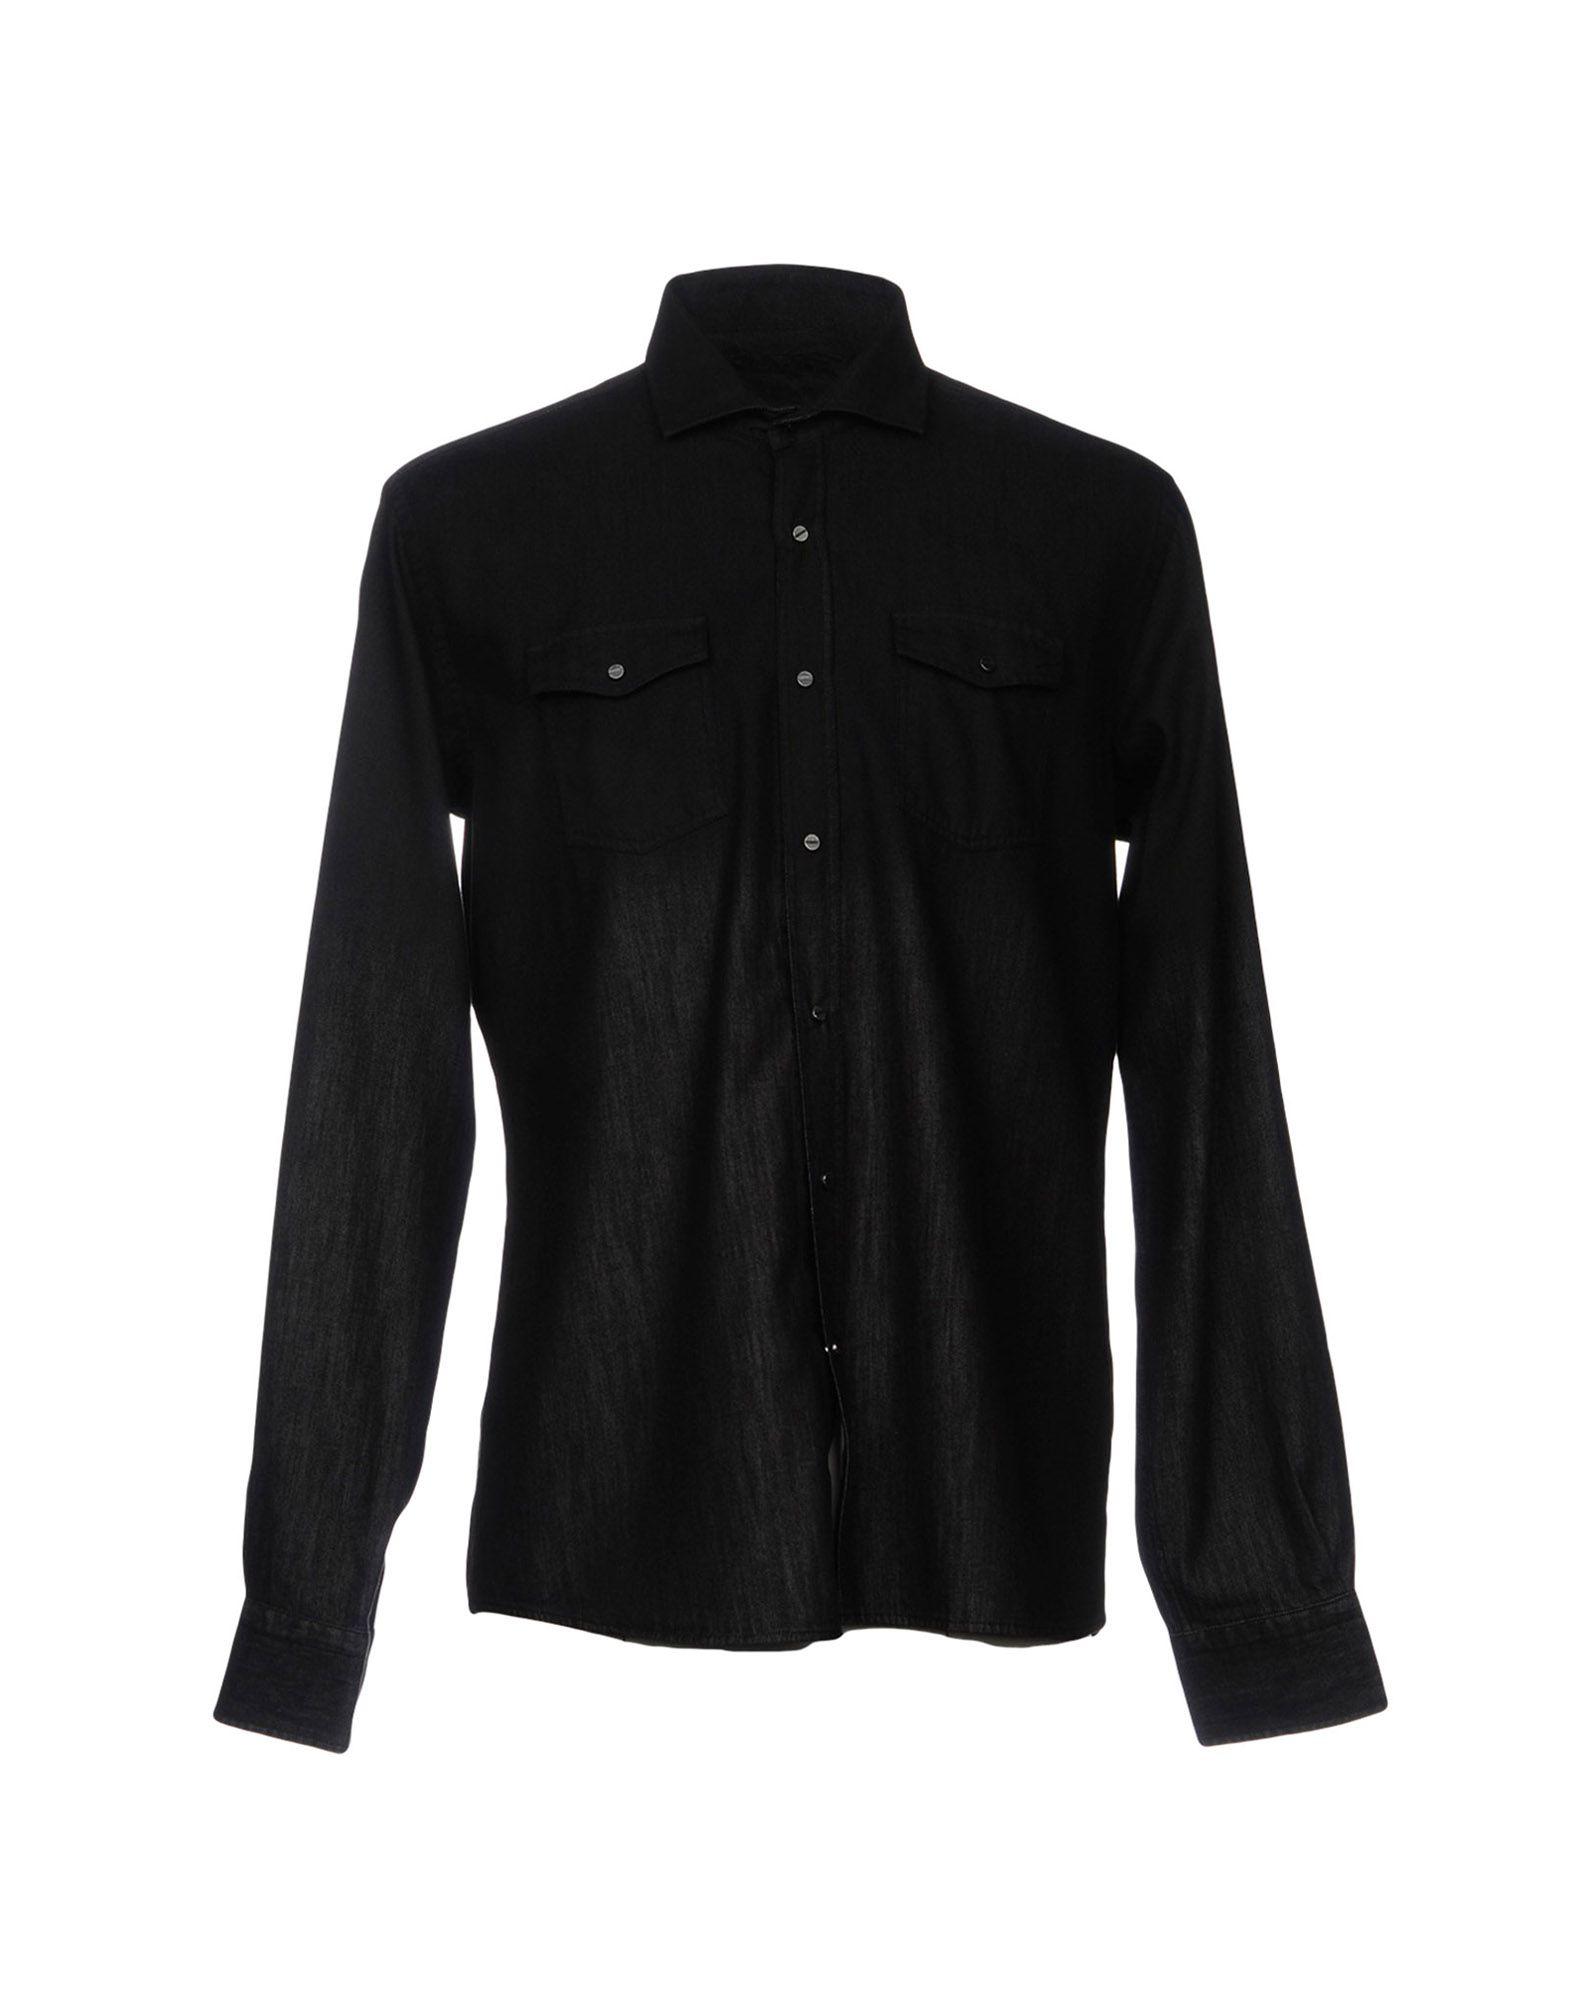 цены на KARL LAGERFELD Джинсовая рубашка в интернет-магазинах